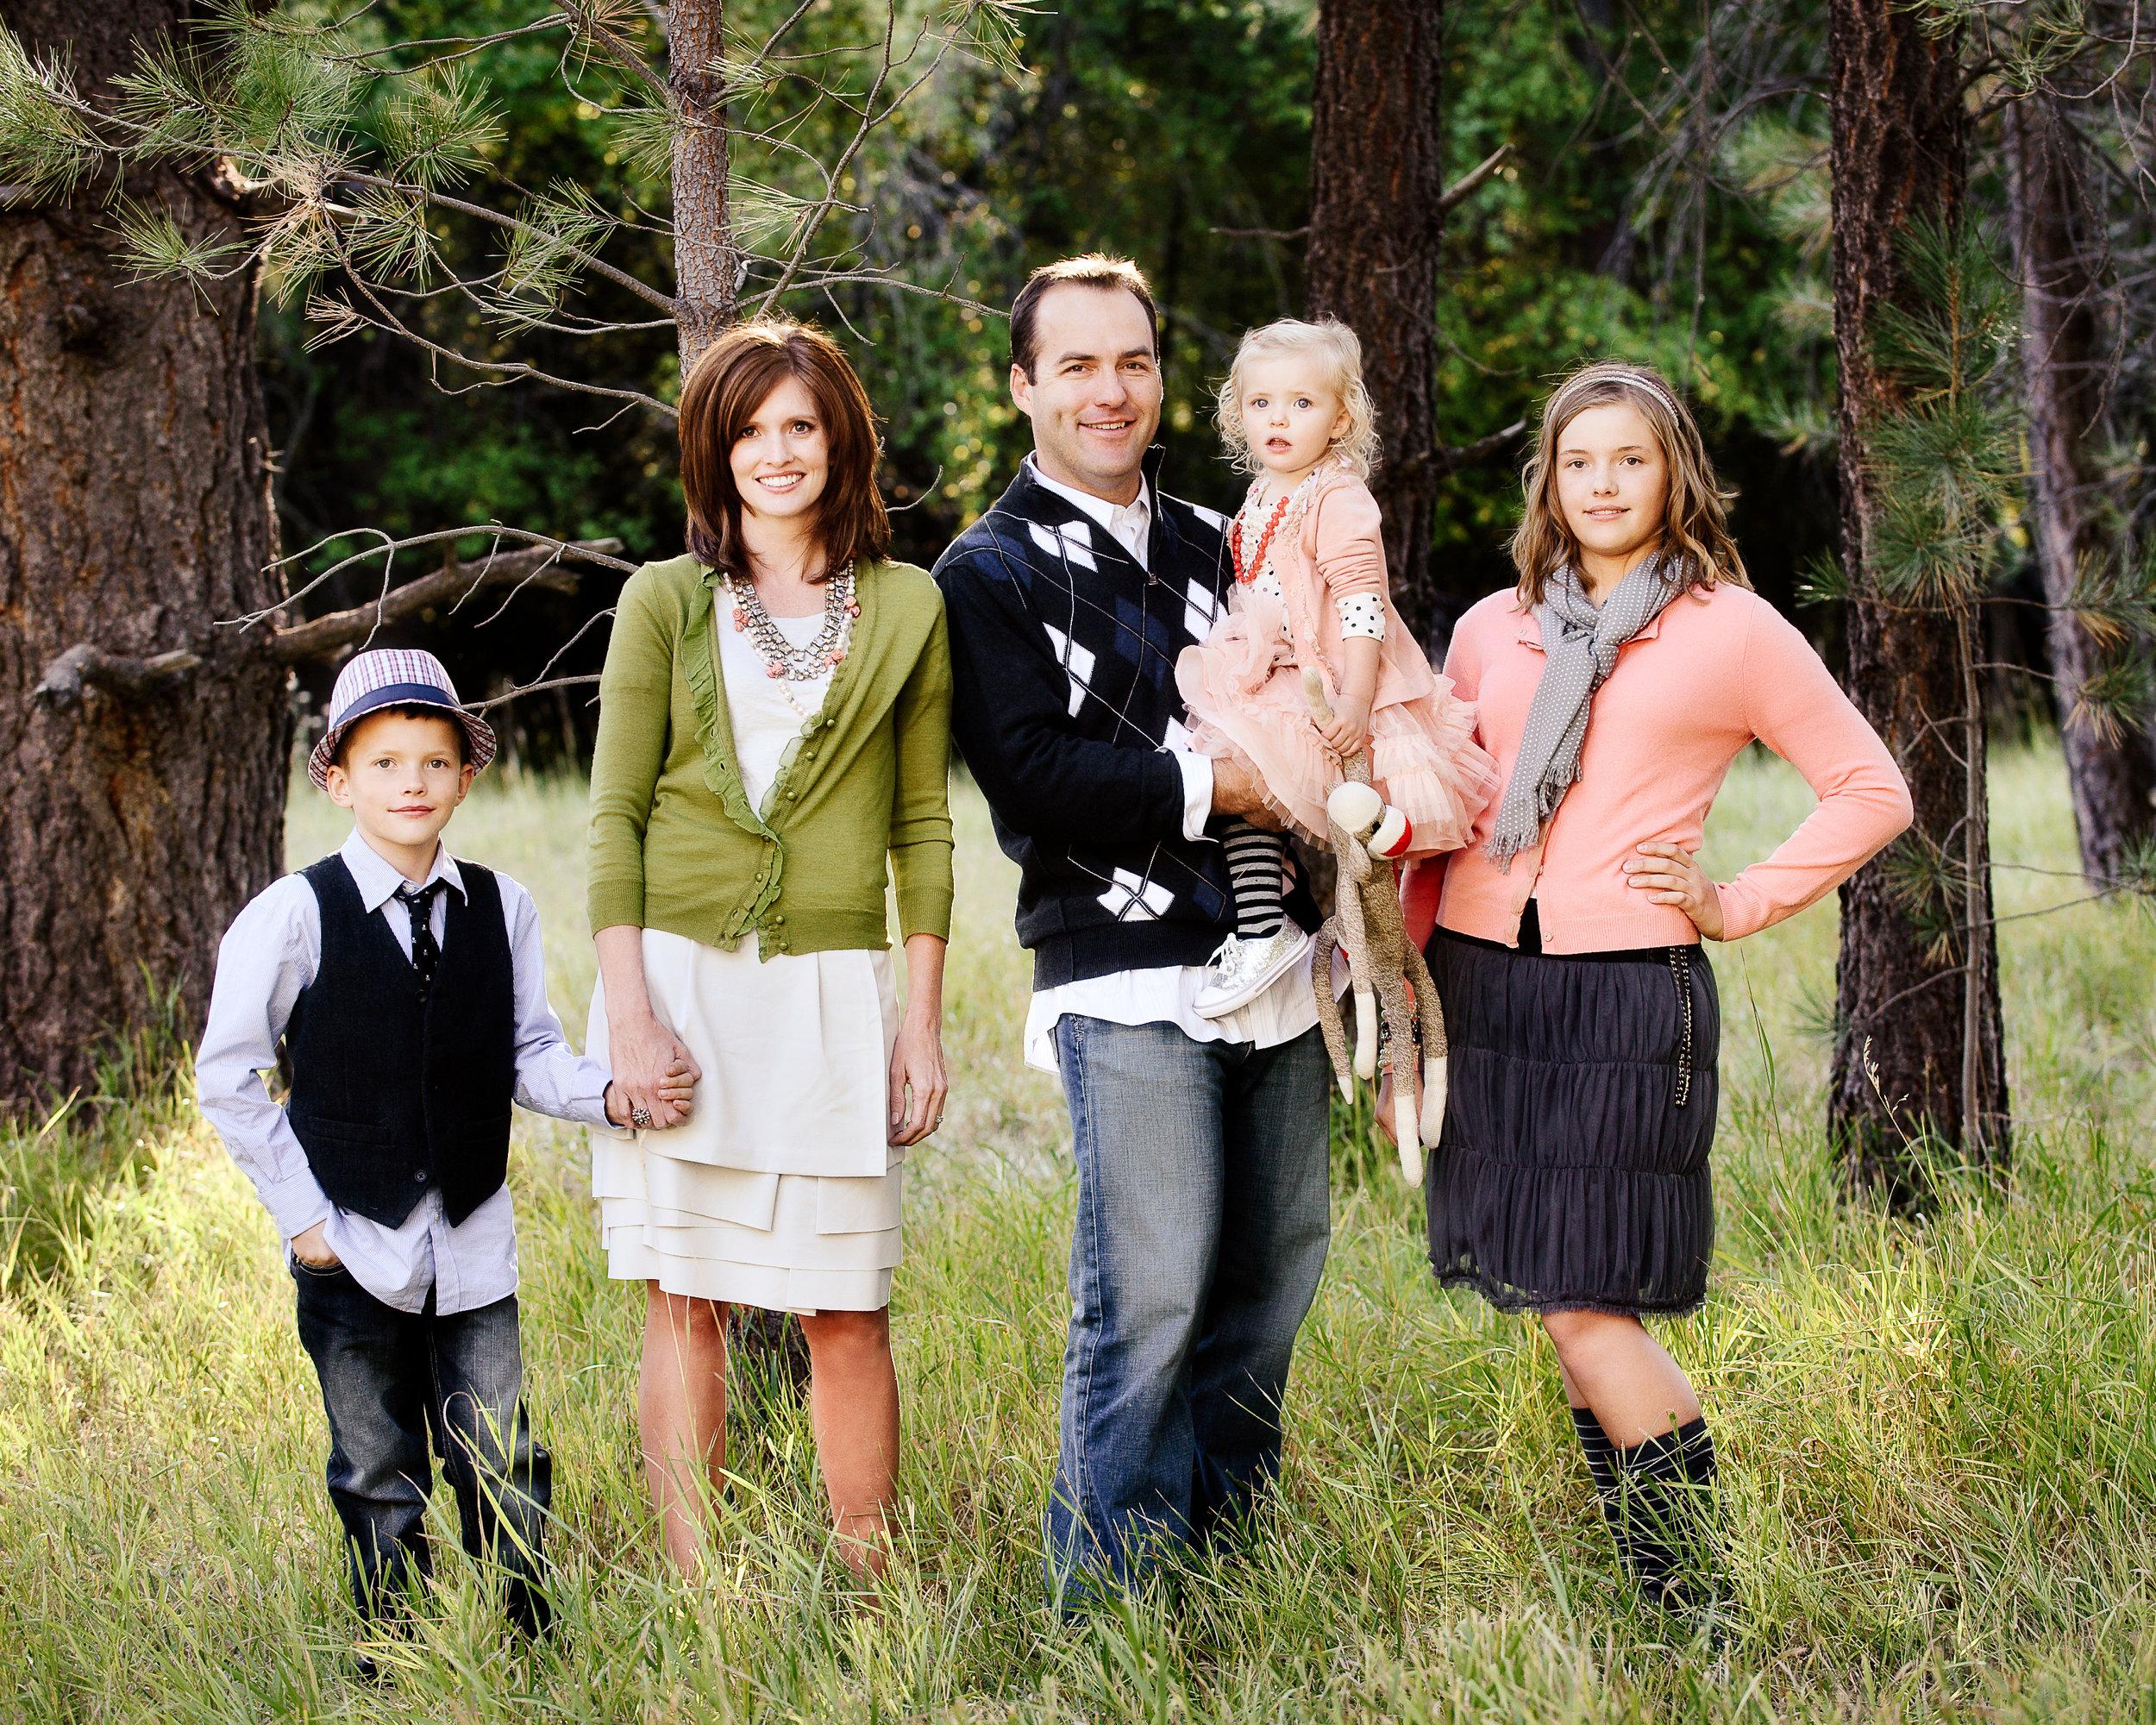 Family portrait on location